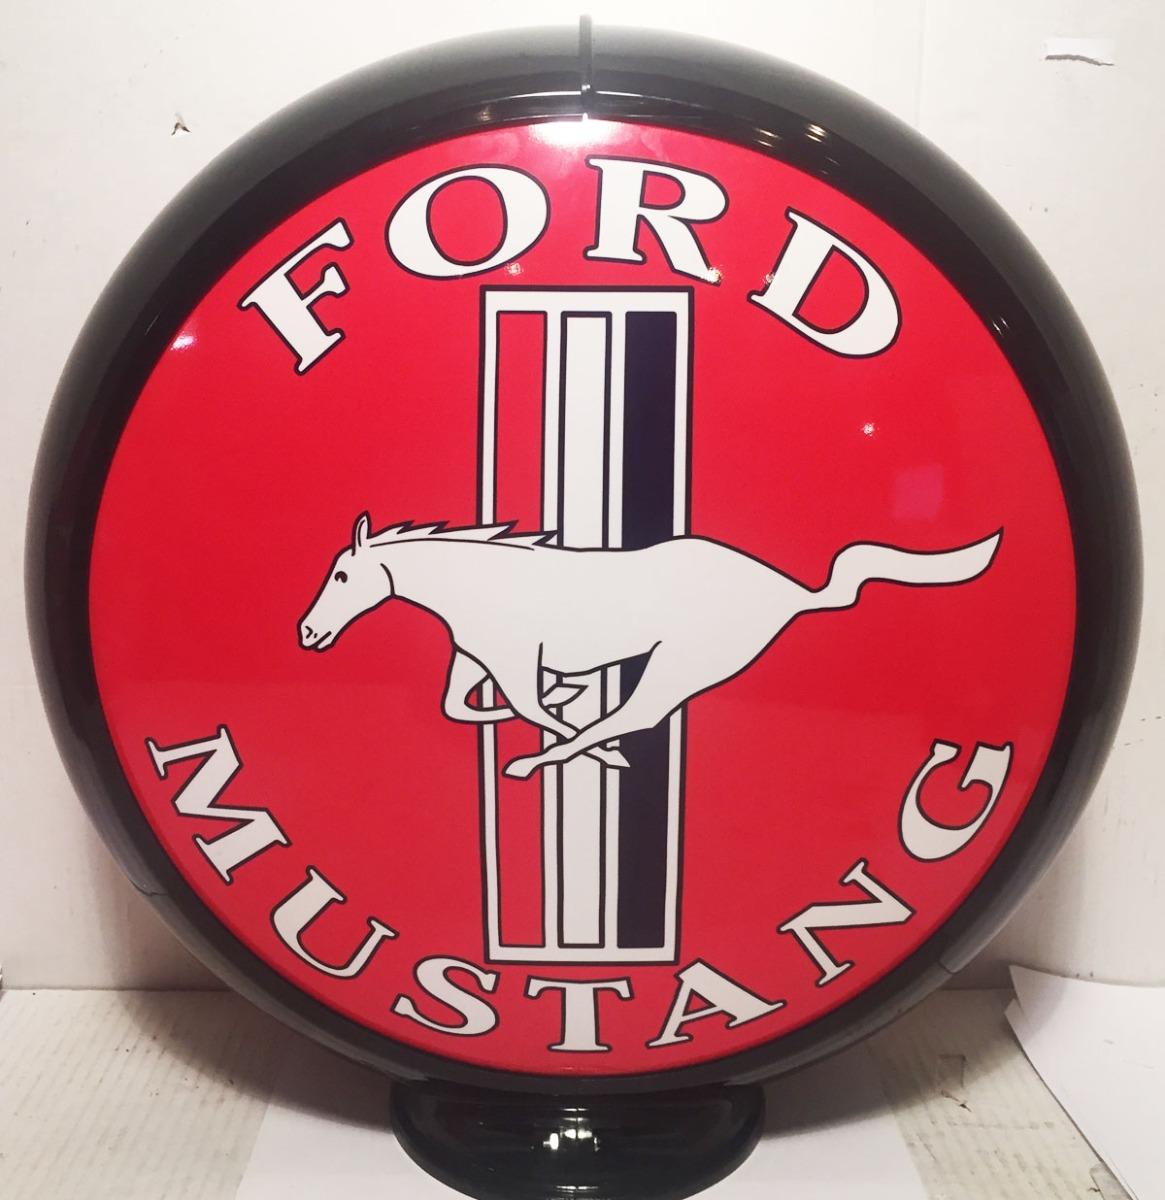 Ford Mustang Benzinepomp Bol